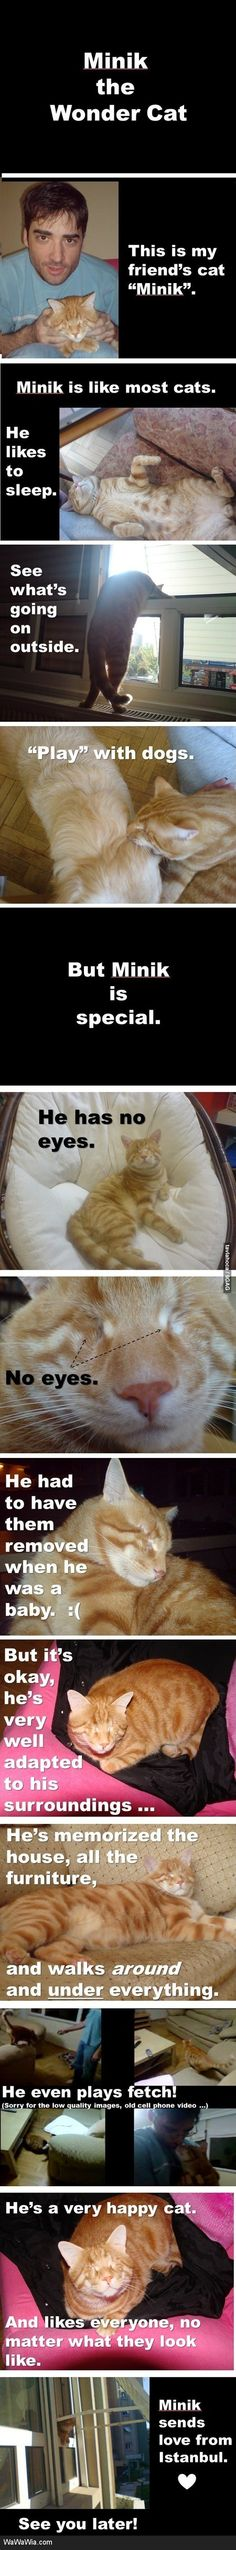 :C aww.. cats, anim, minik, stuff, wondercat, inspir, kitti, wonder cat, thing